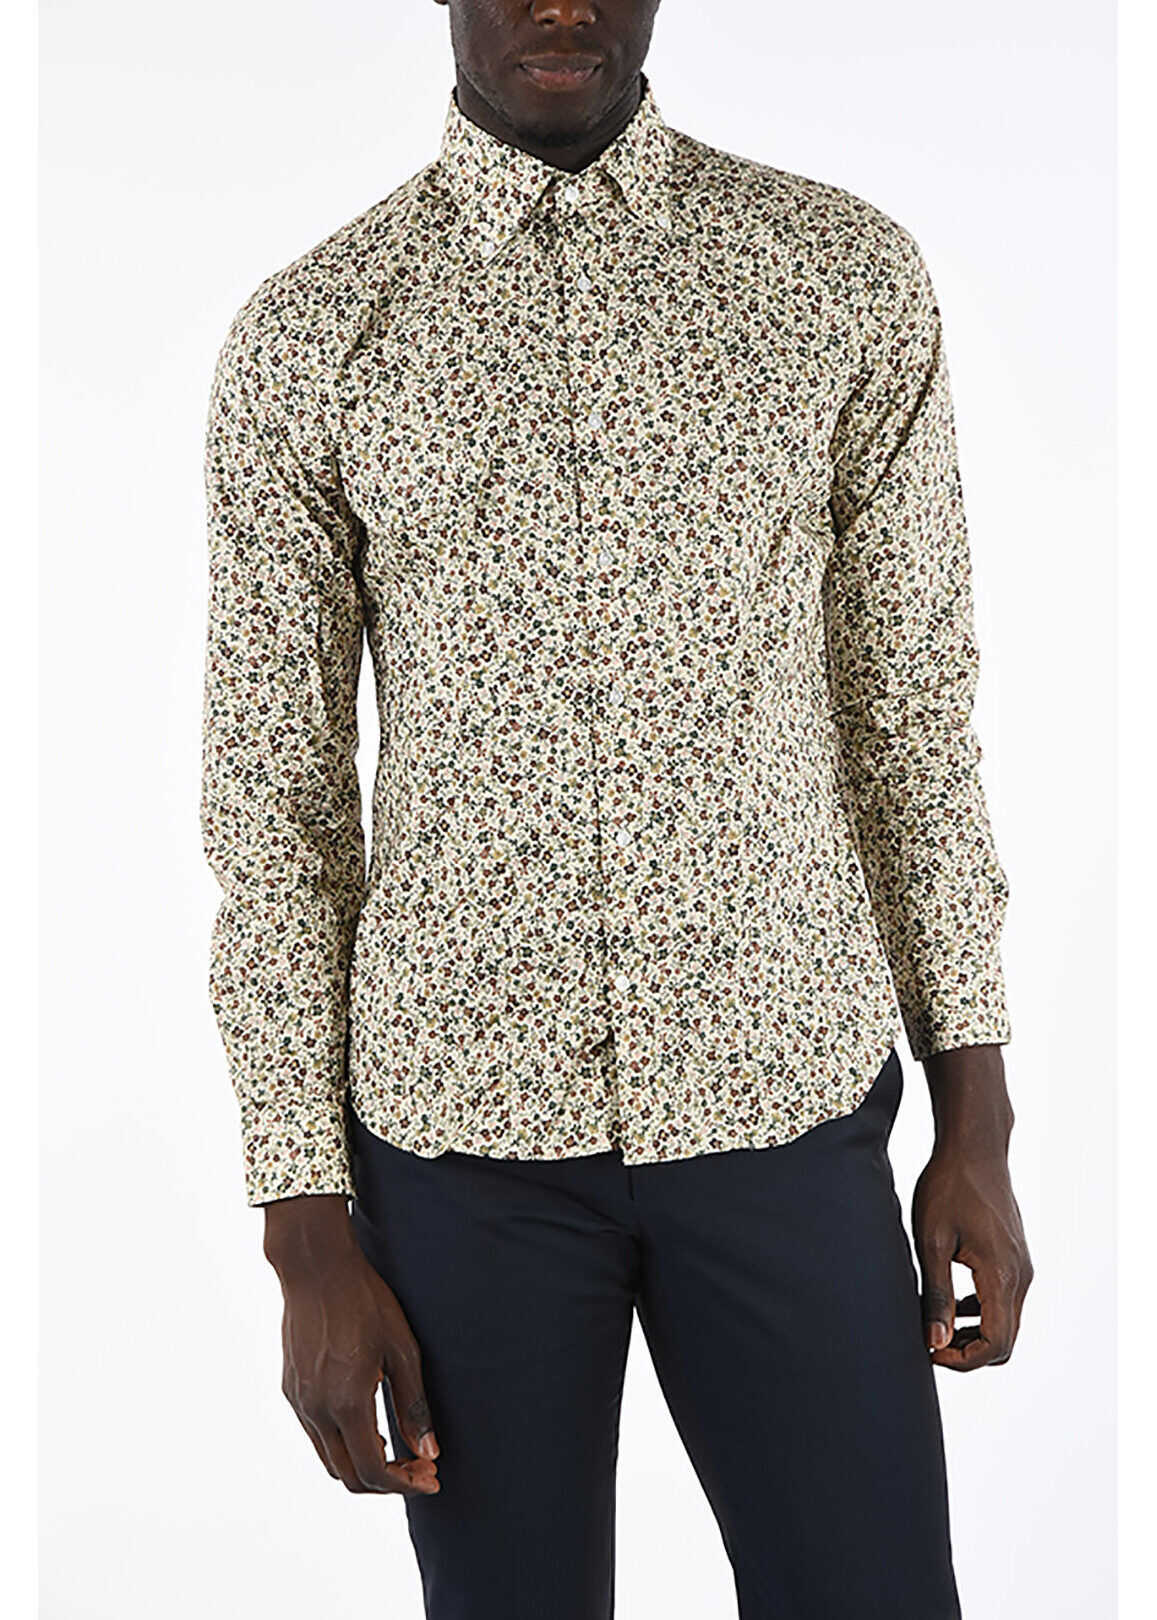 CORNELIANI CC COLLECTION Floral Printed Button Down Shirt BEIGE imagine